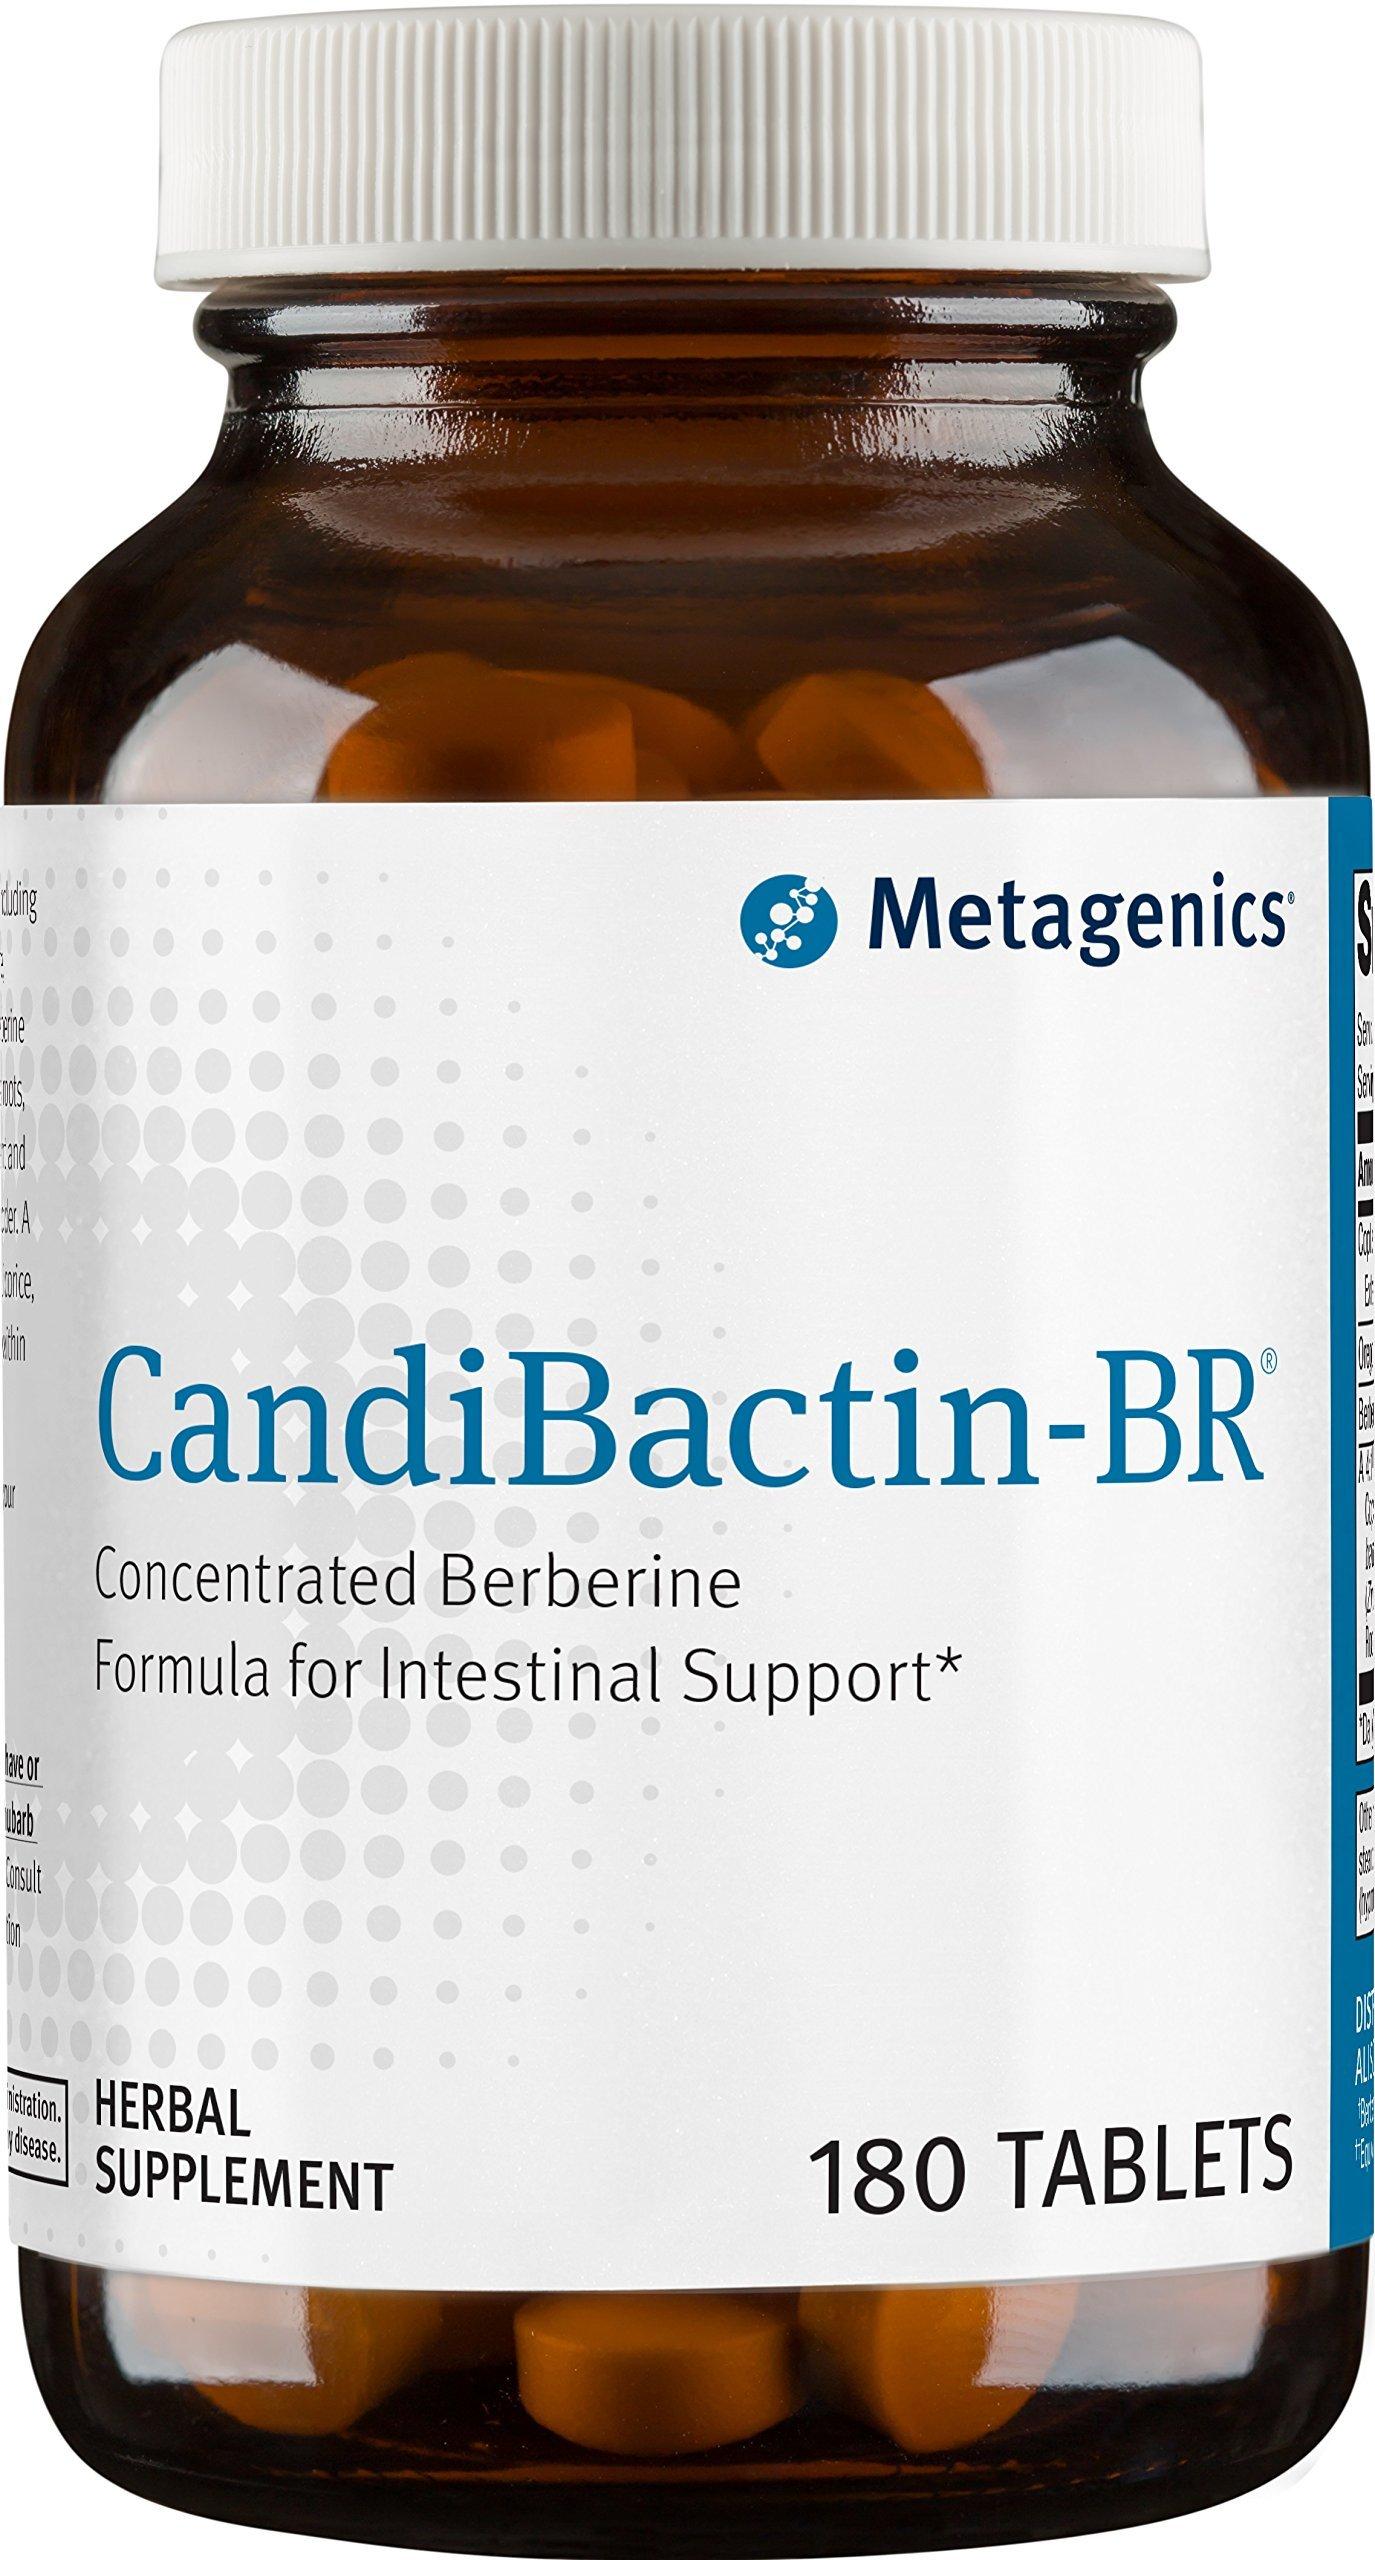 Metagenics Candibactin-BR, 180 Count